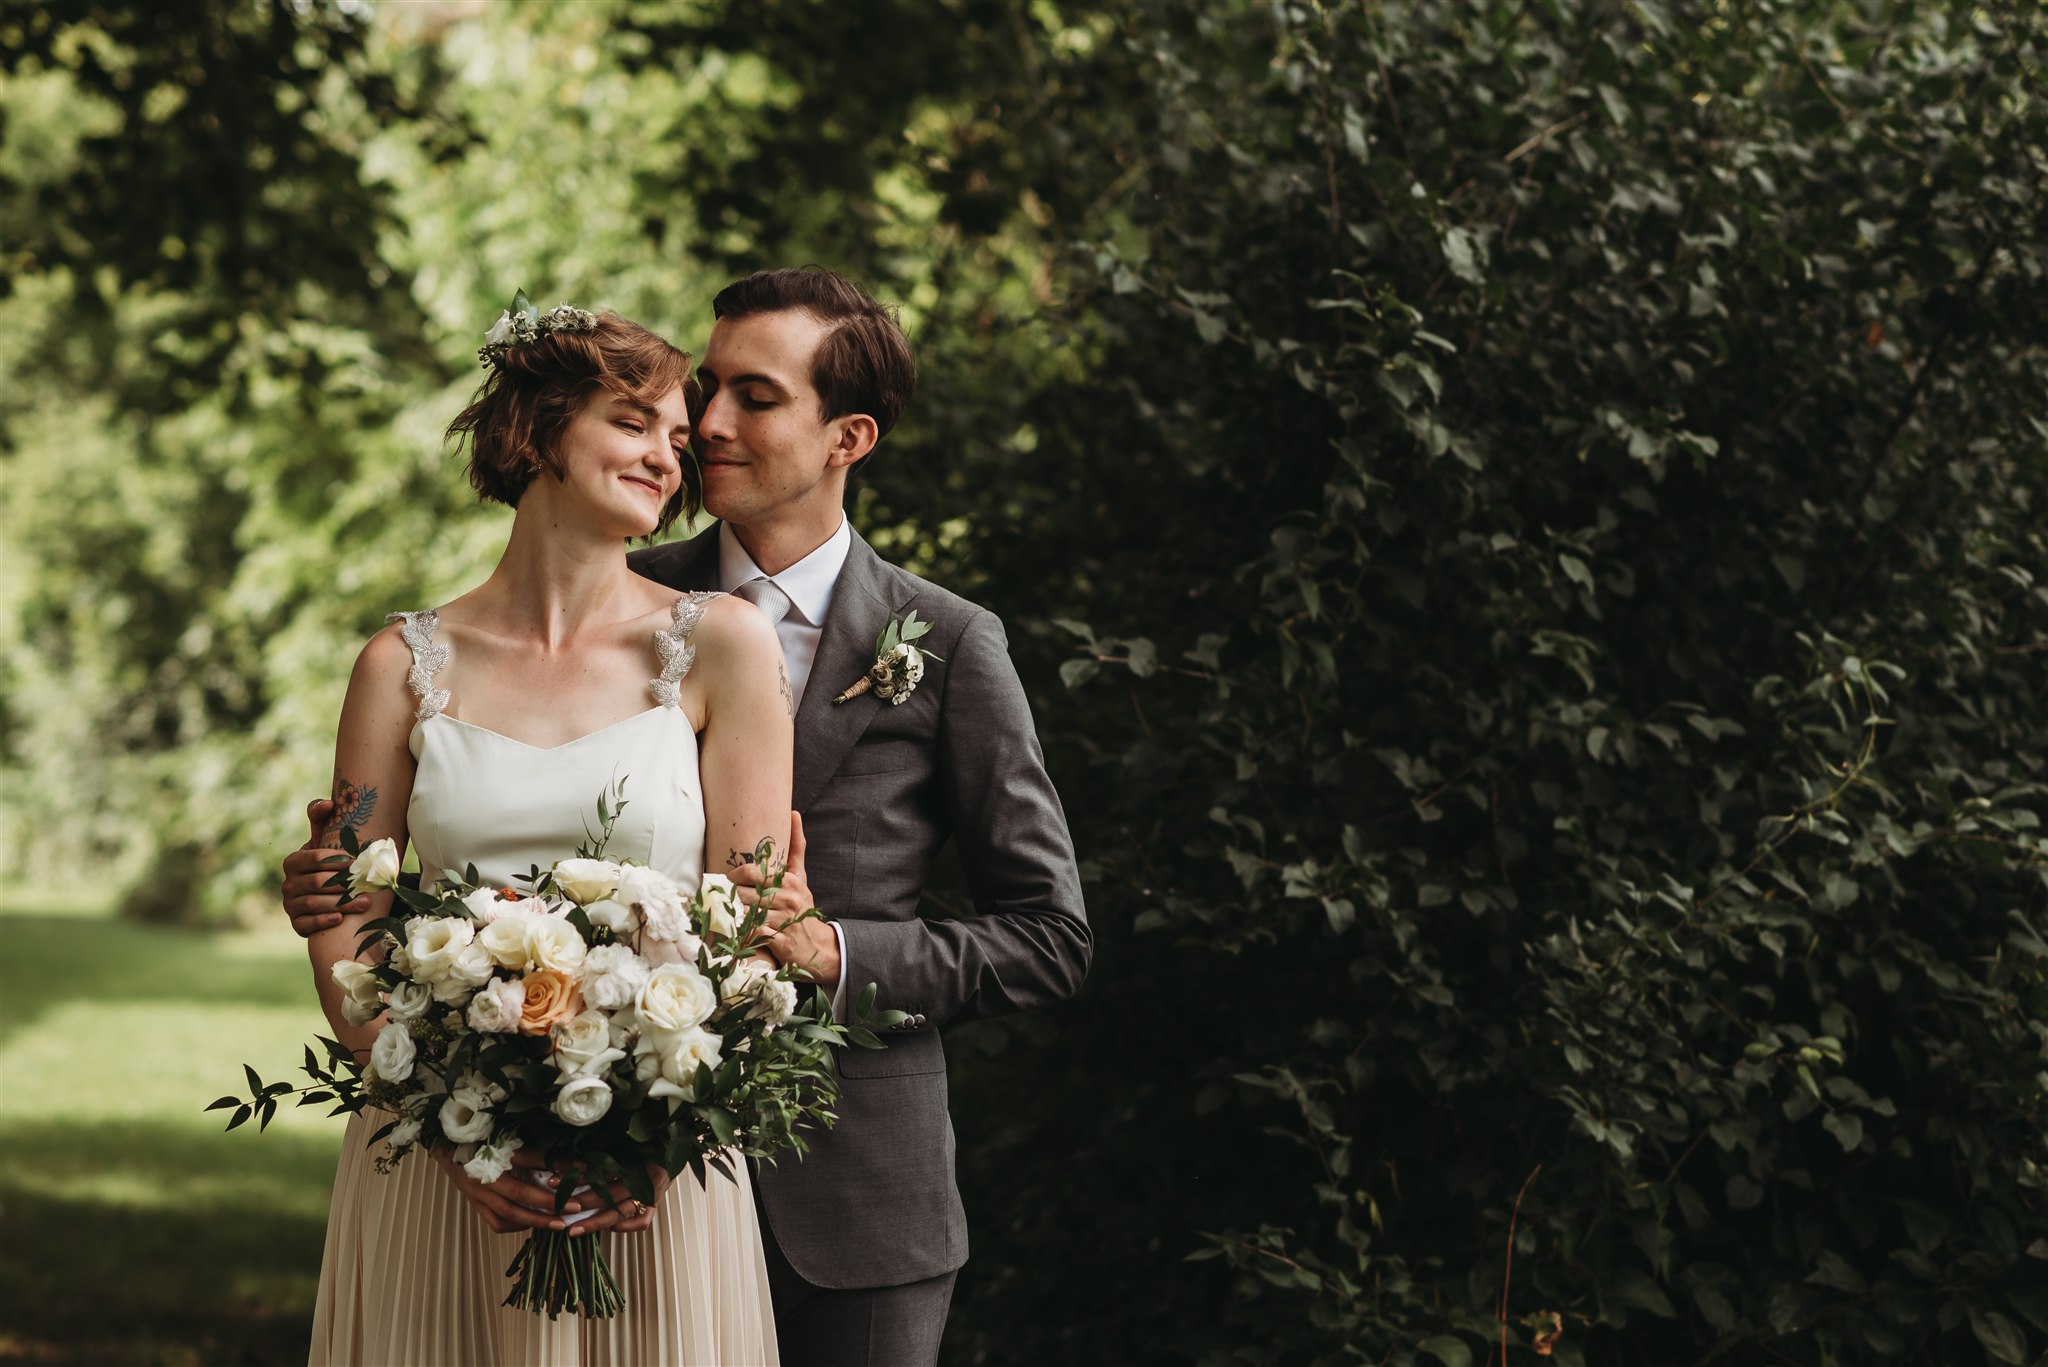 fanshawe conservation area wedding photos 332 1 - Watson Porter Pavillion Wedding